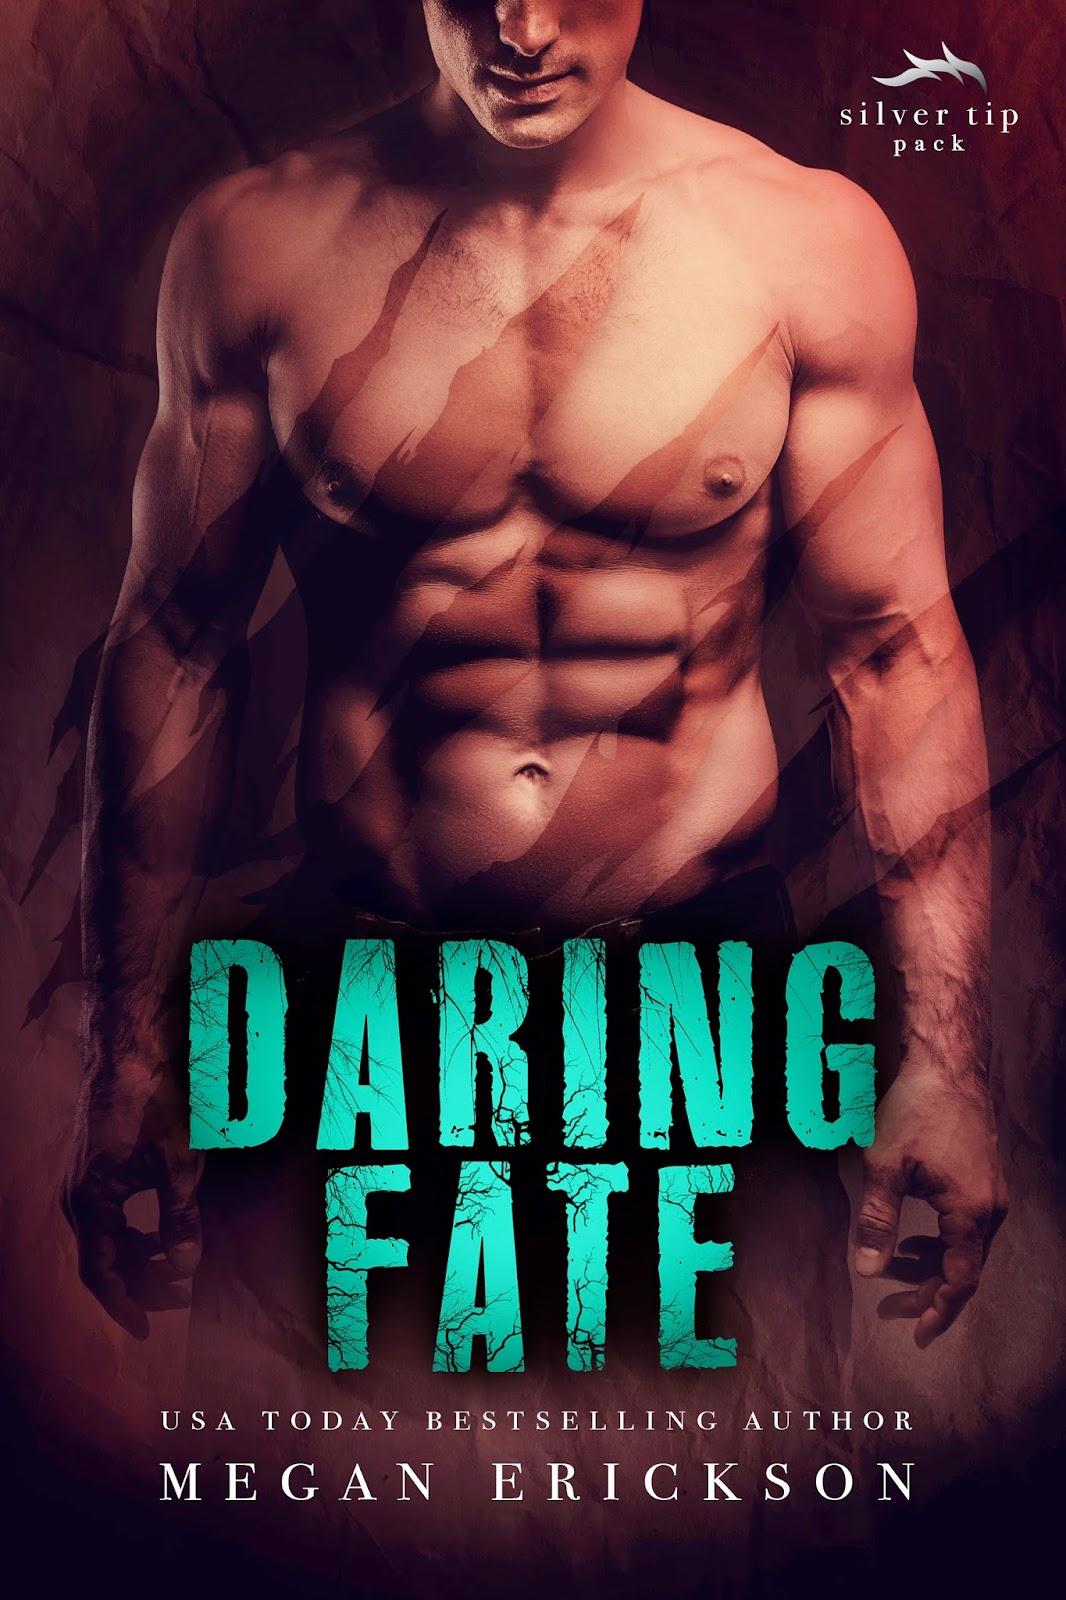 Daring Fate, Megan Erickson, Silver Tip Pack,